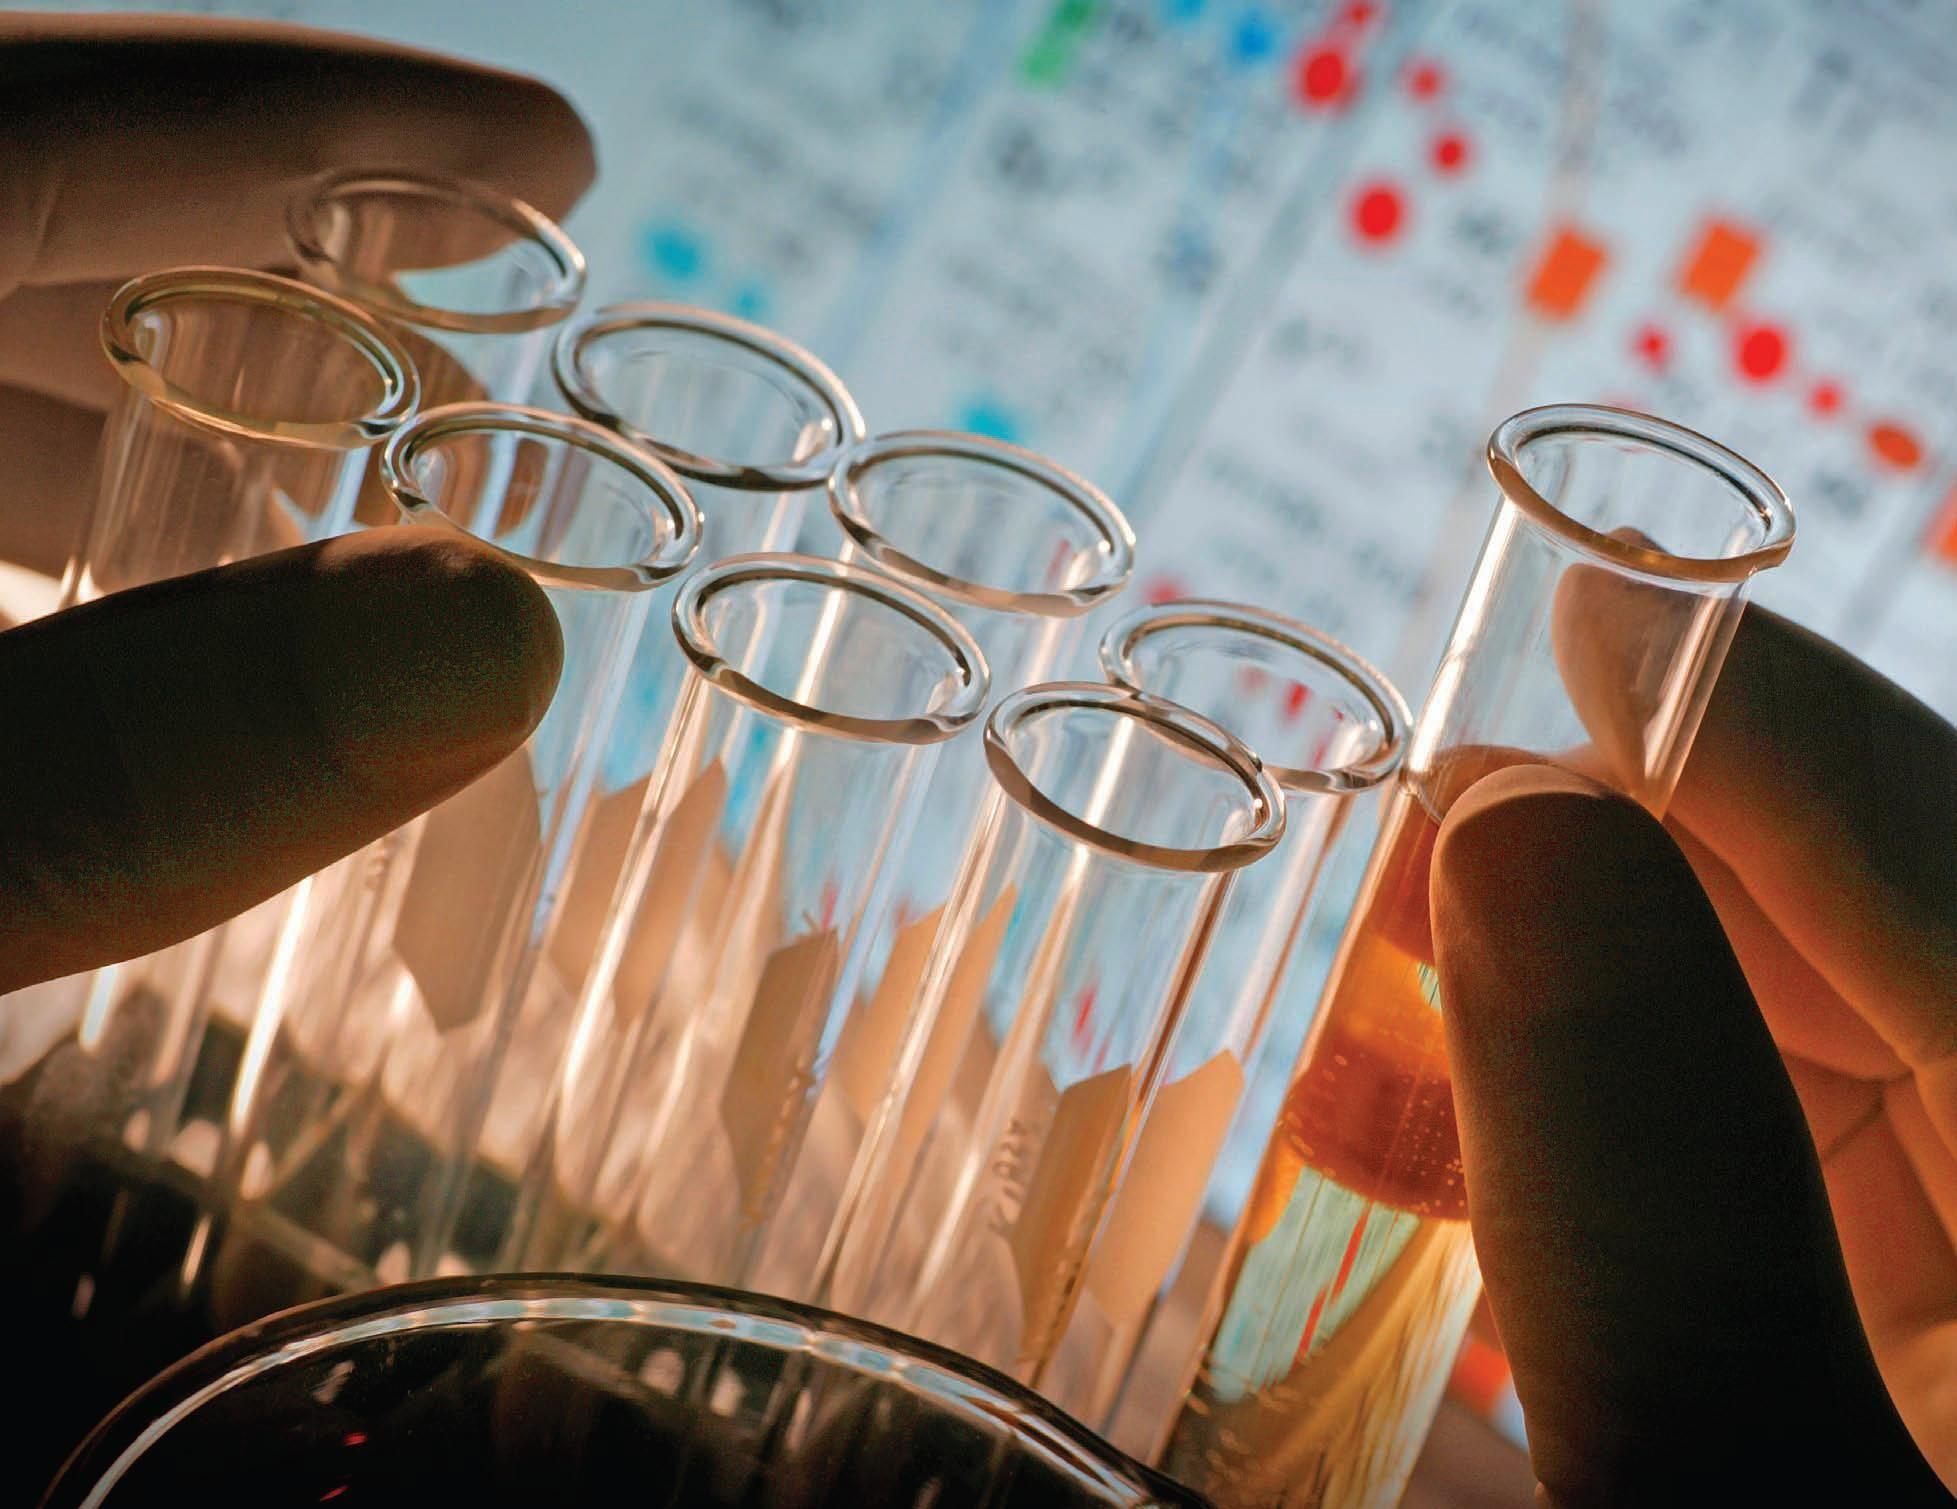 http://www.panoramasanita.it/wp-content/uploads/2014/06/farmaco-biotech.jpg